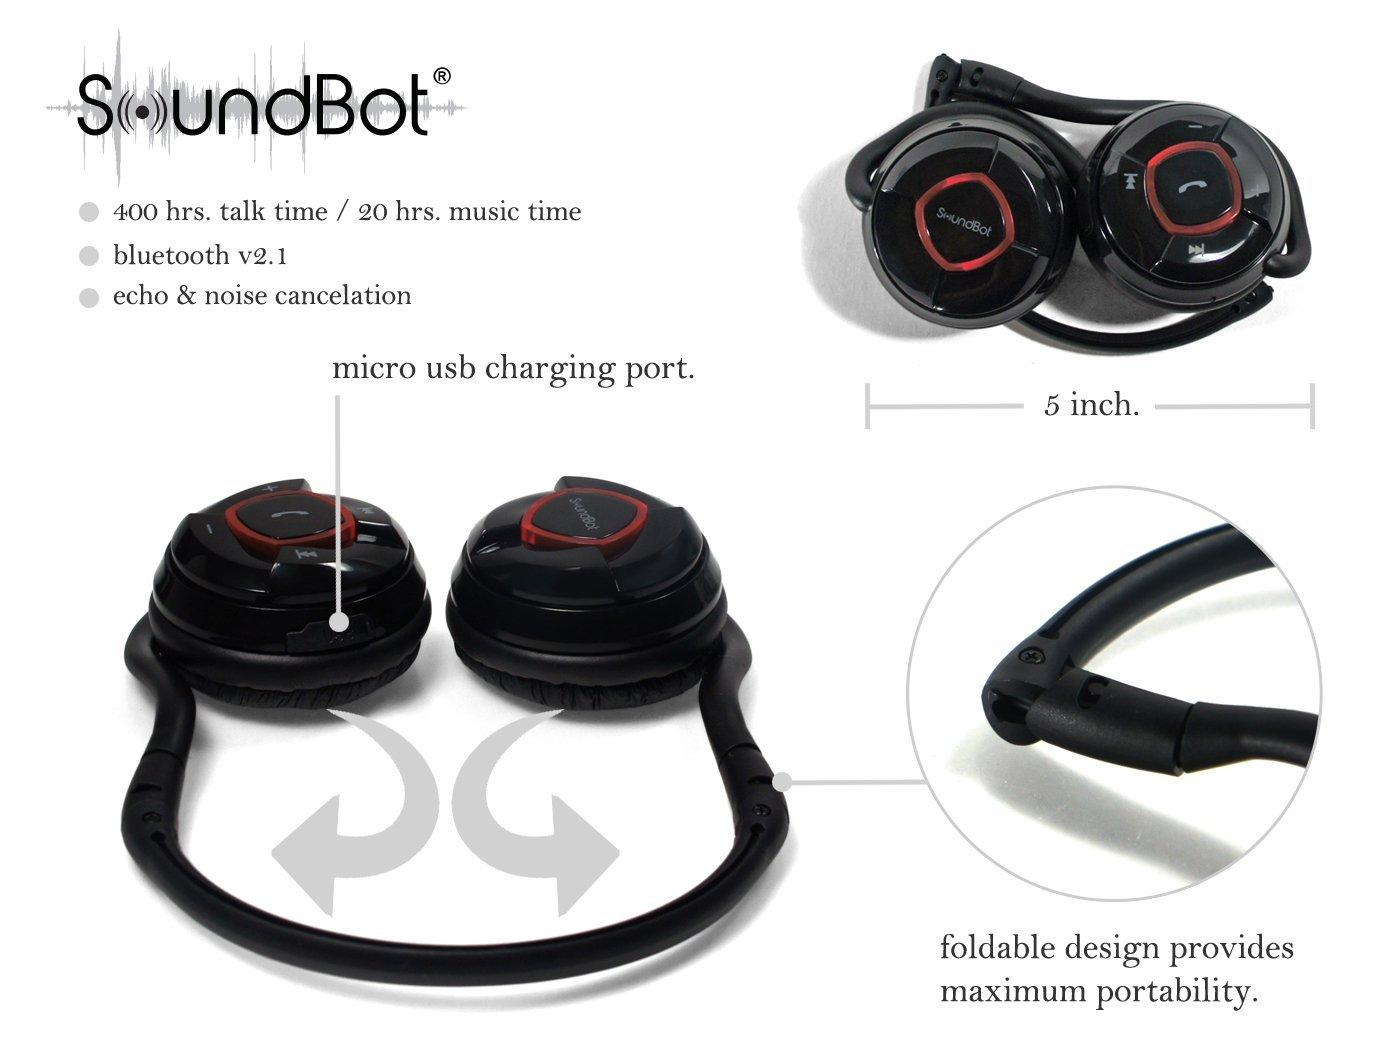 soundbot sb240 kermes bluetooth wireless headphones review. Black Bedroom Furniture Sets. Home Design Ideas